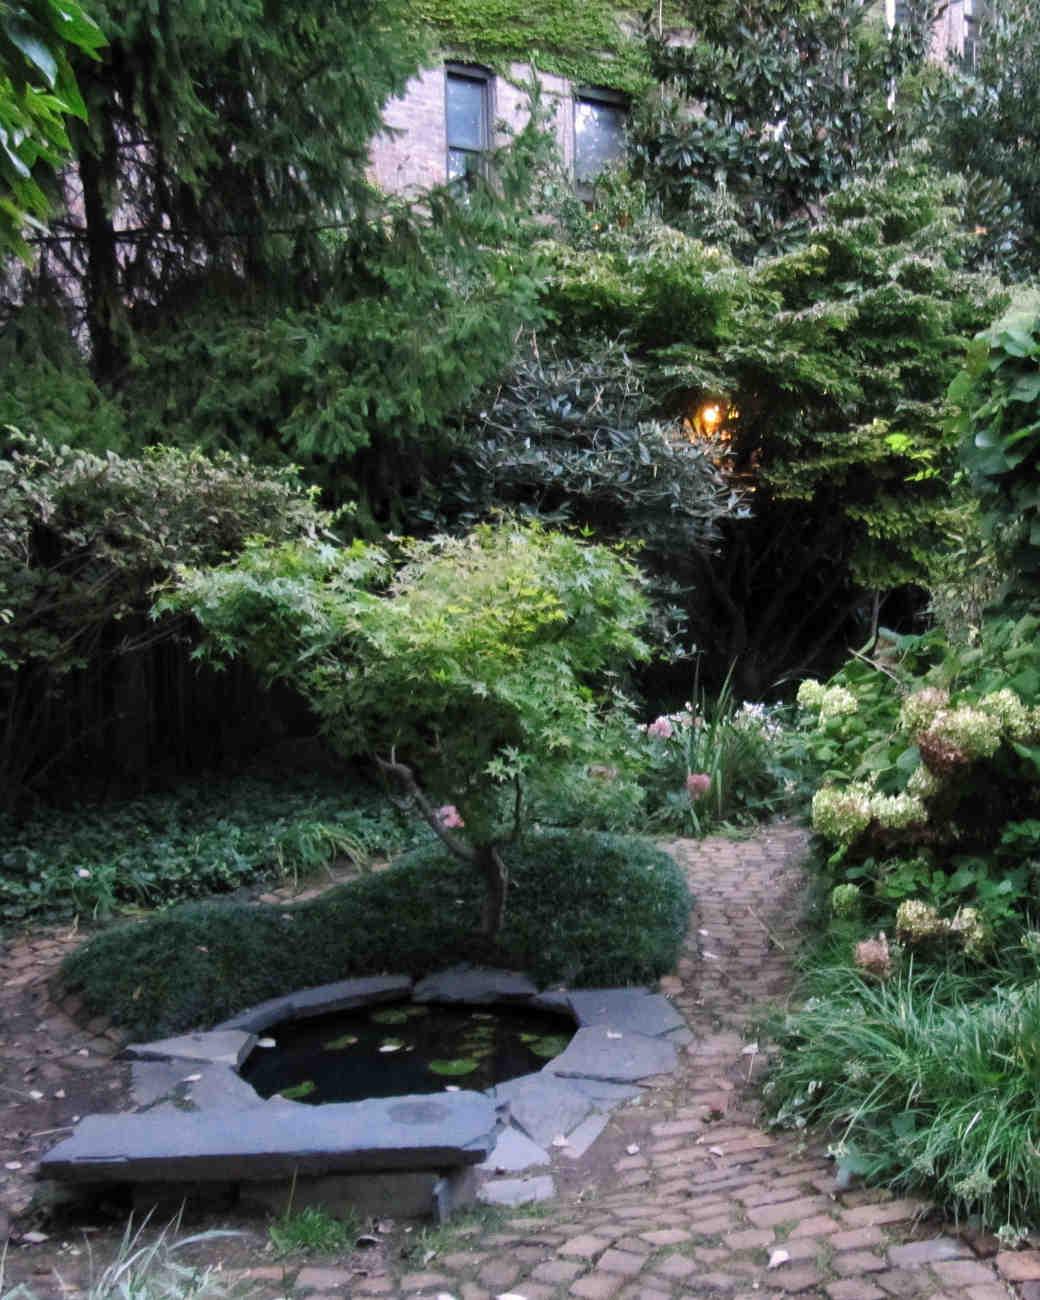 nyc-proposal-spot-alphabet-city-community-garden-1114.jpg